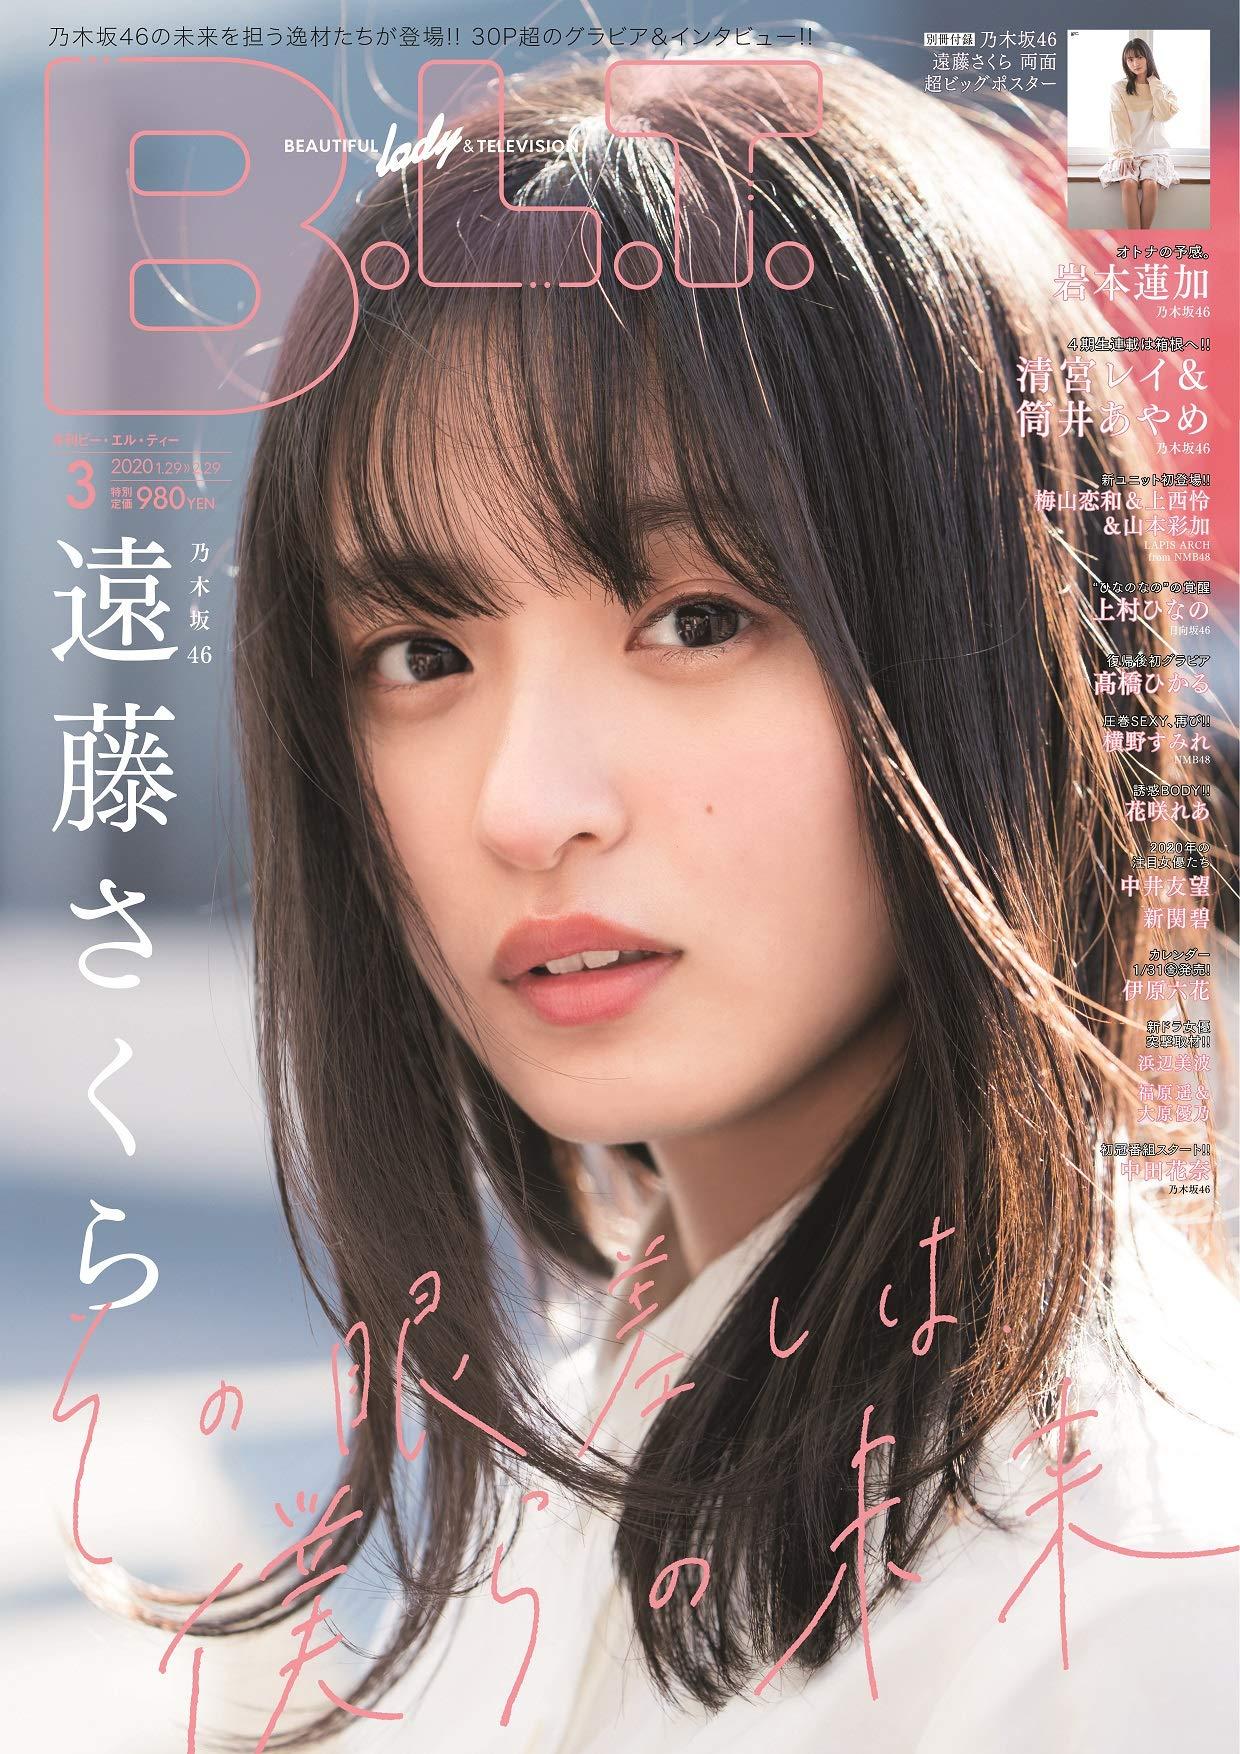 B.L.T. 2020年03月号 乃木坂46 遠藤さくら